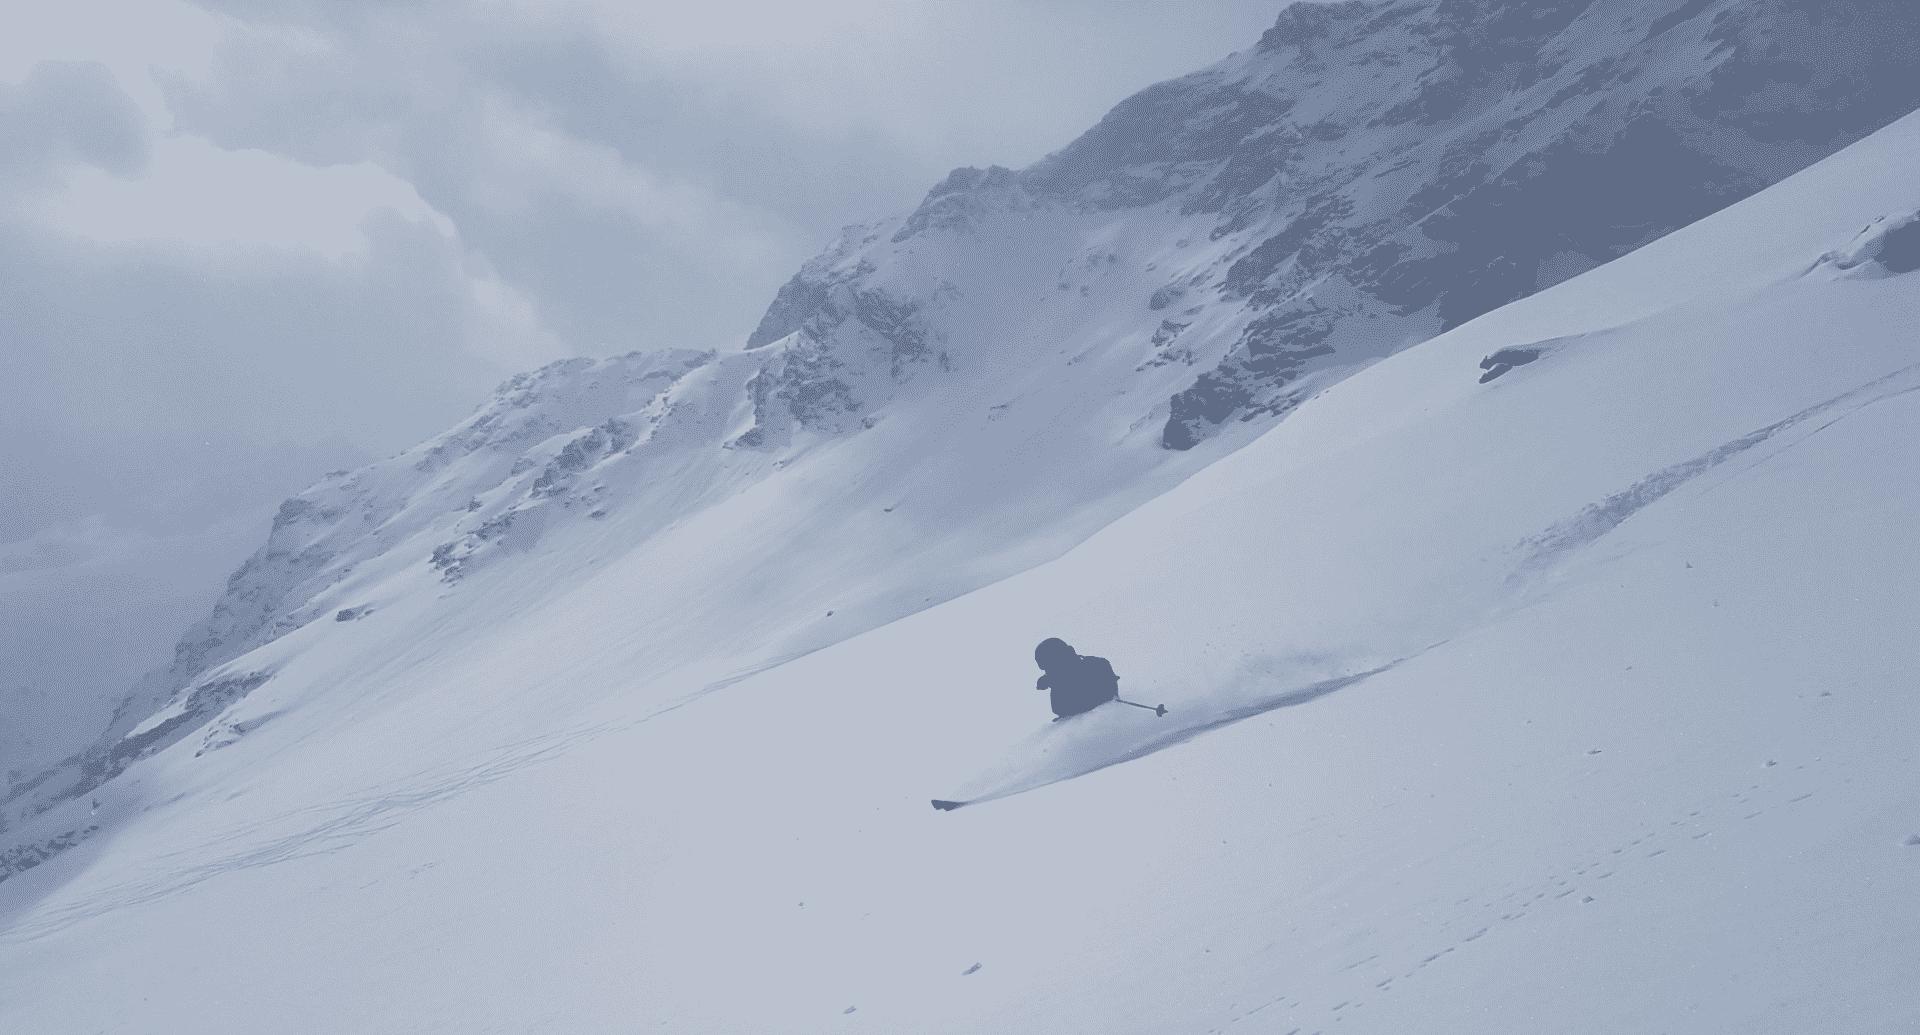 Gressoney: freeride skiing day in Monte Rosa